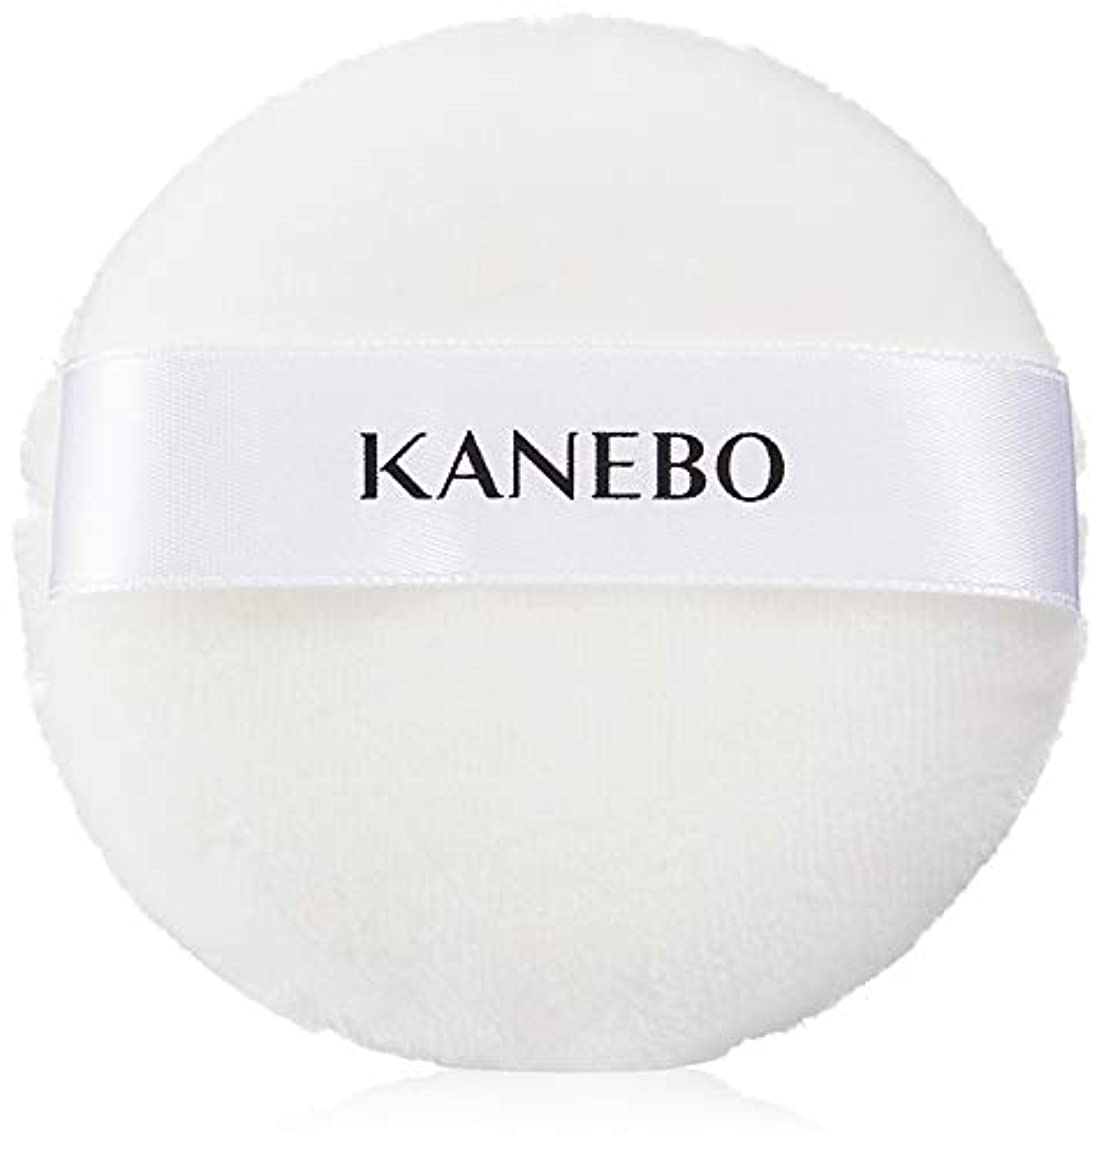 KANEBO(カネボウ) カネボウ フィニッシュパウダーパフ パフ(おしろい用)